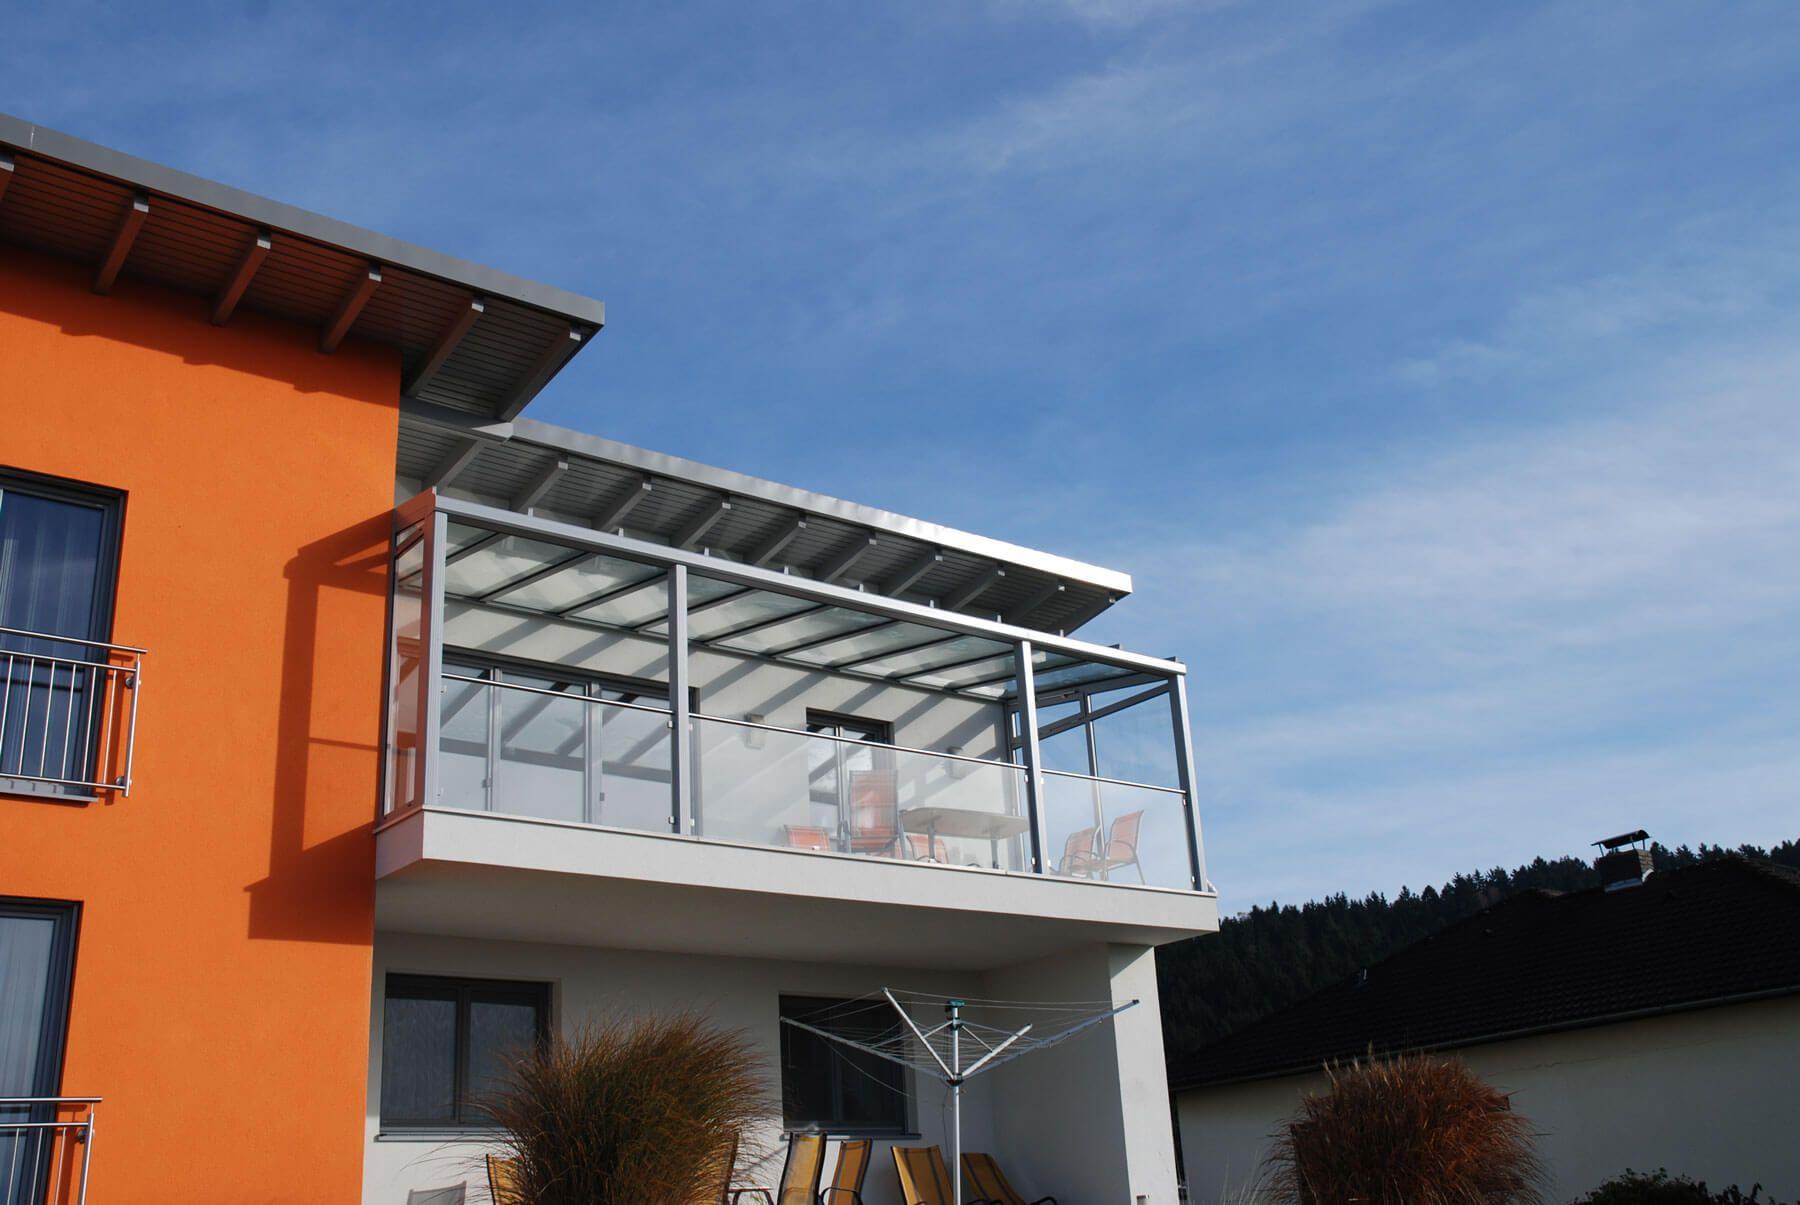 Terrassenüberdachung Balkon | Terrassenüberdachung, Balkon und ...